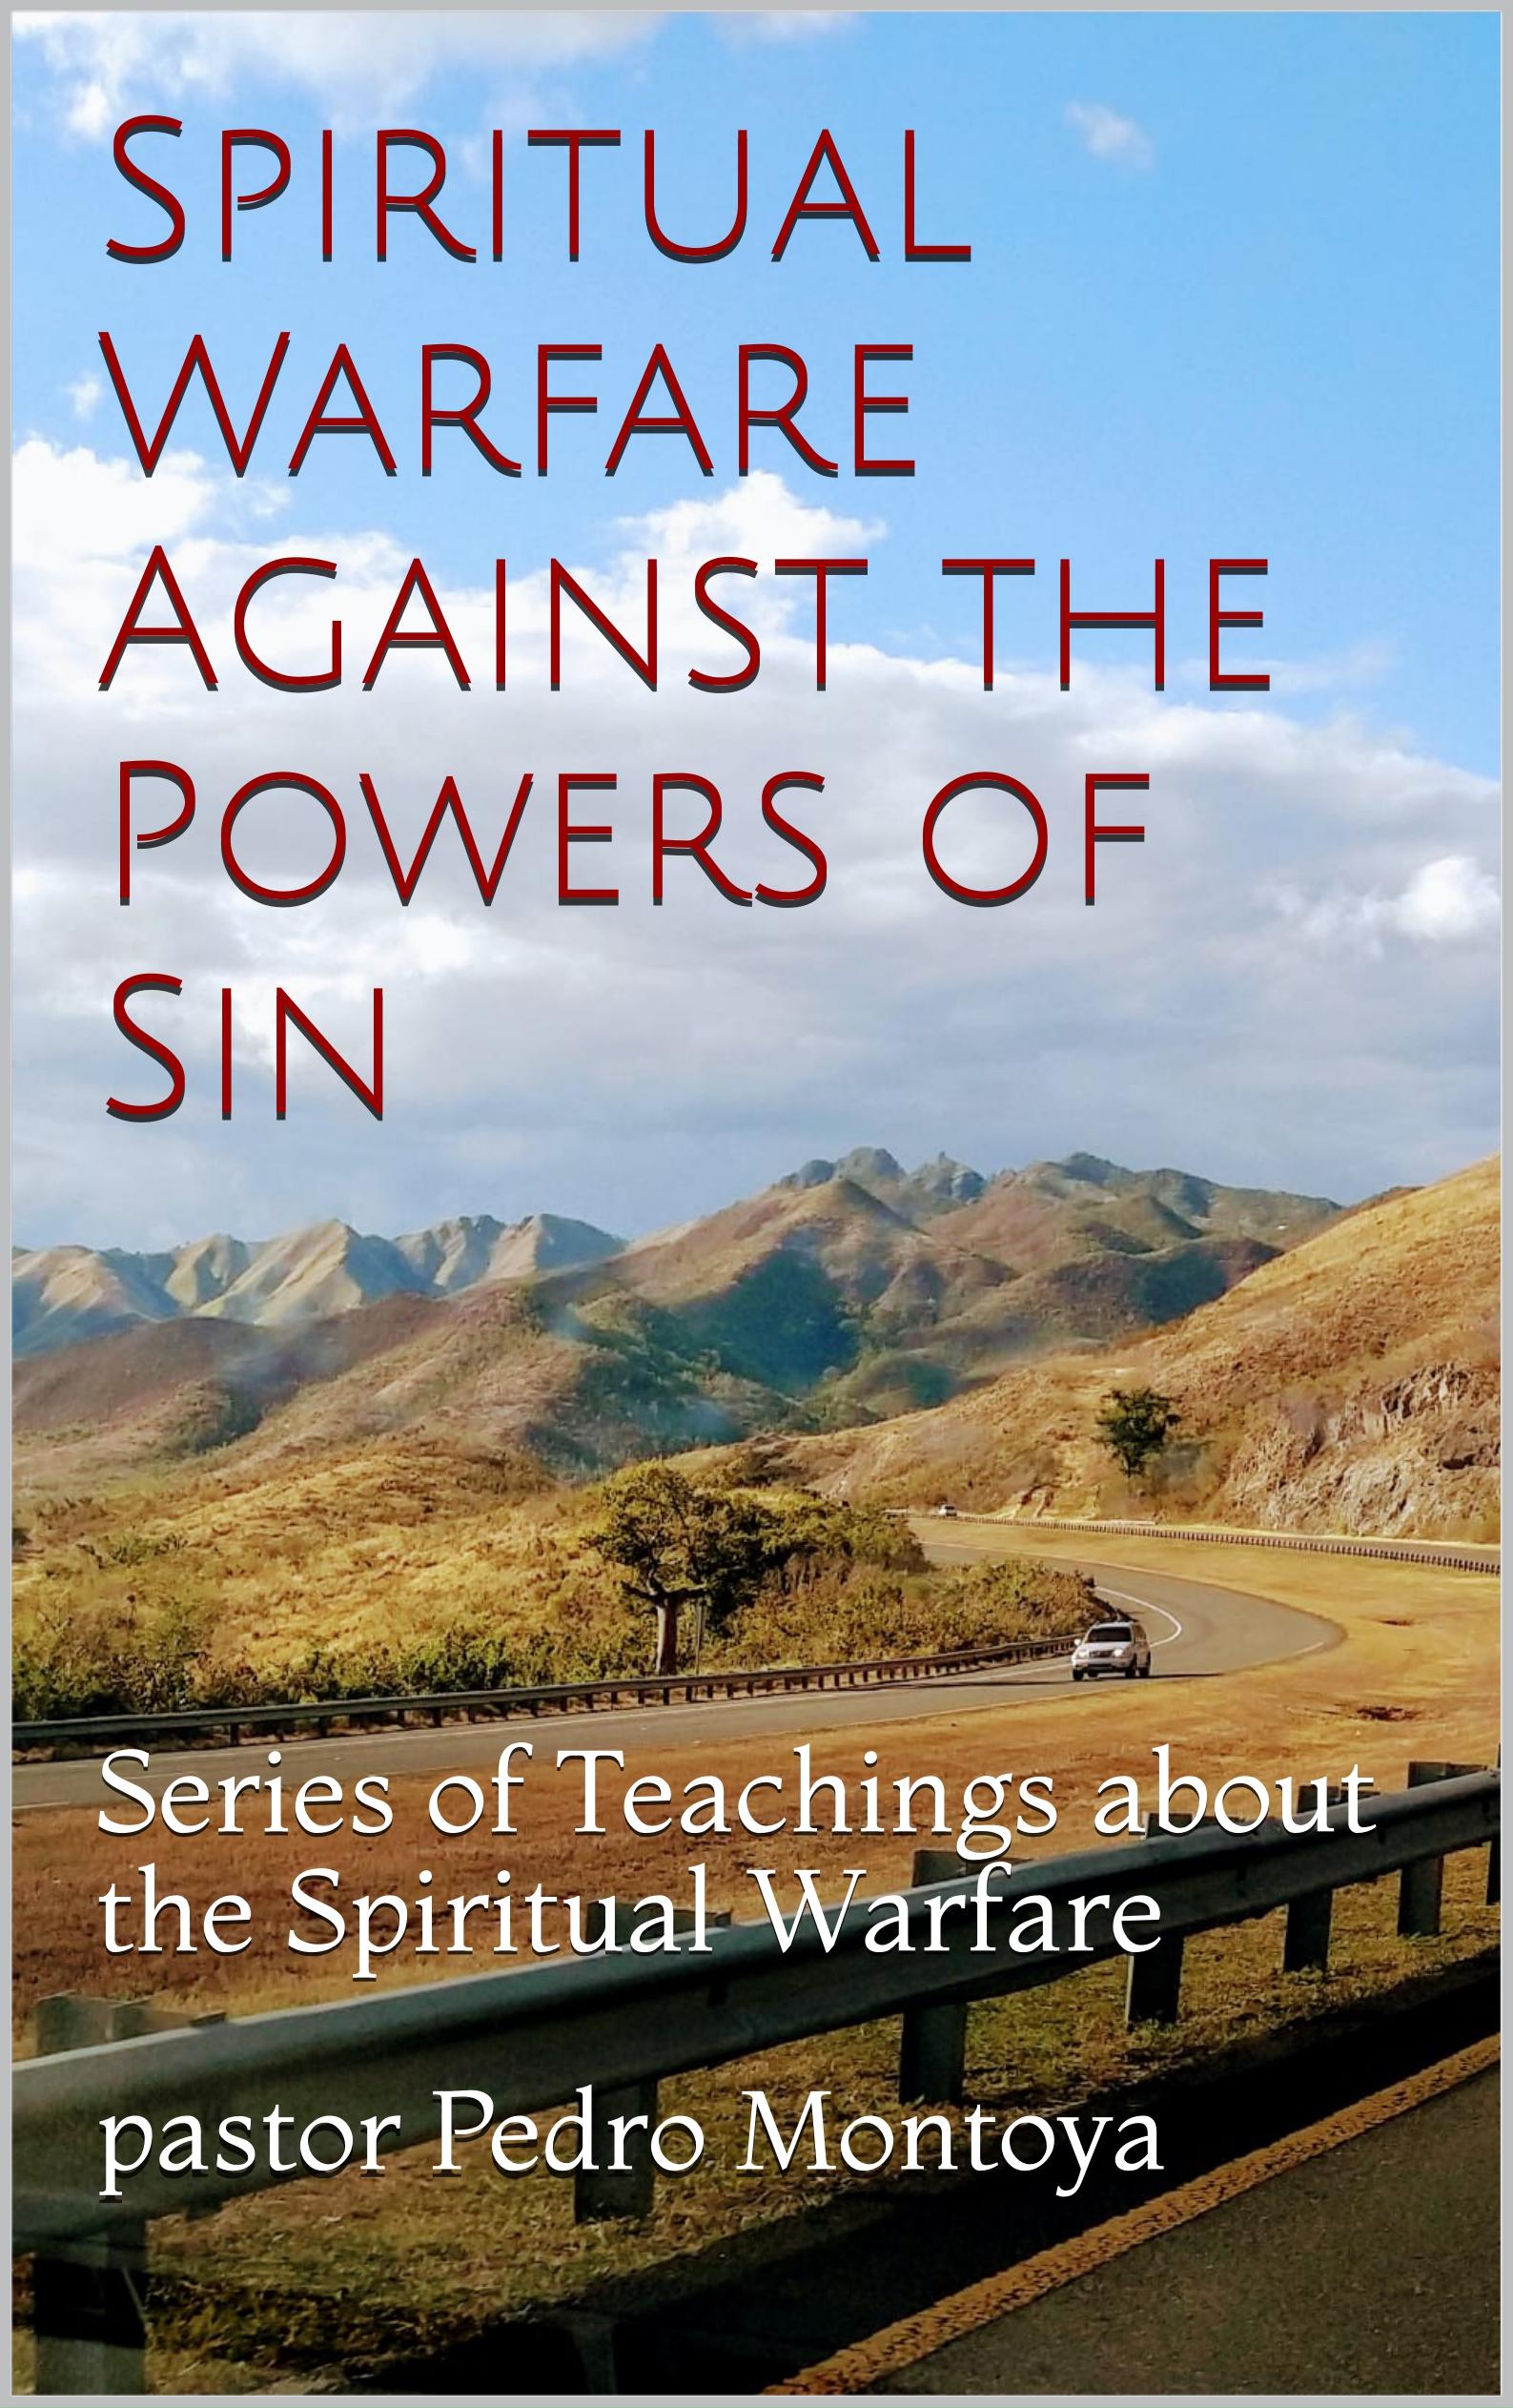 SPIRITUAL WARFARE AGAINST THE POWER OF SIN